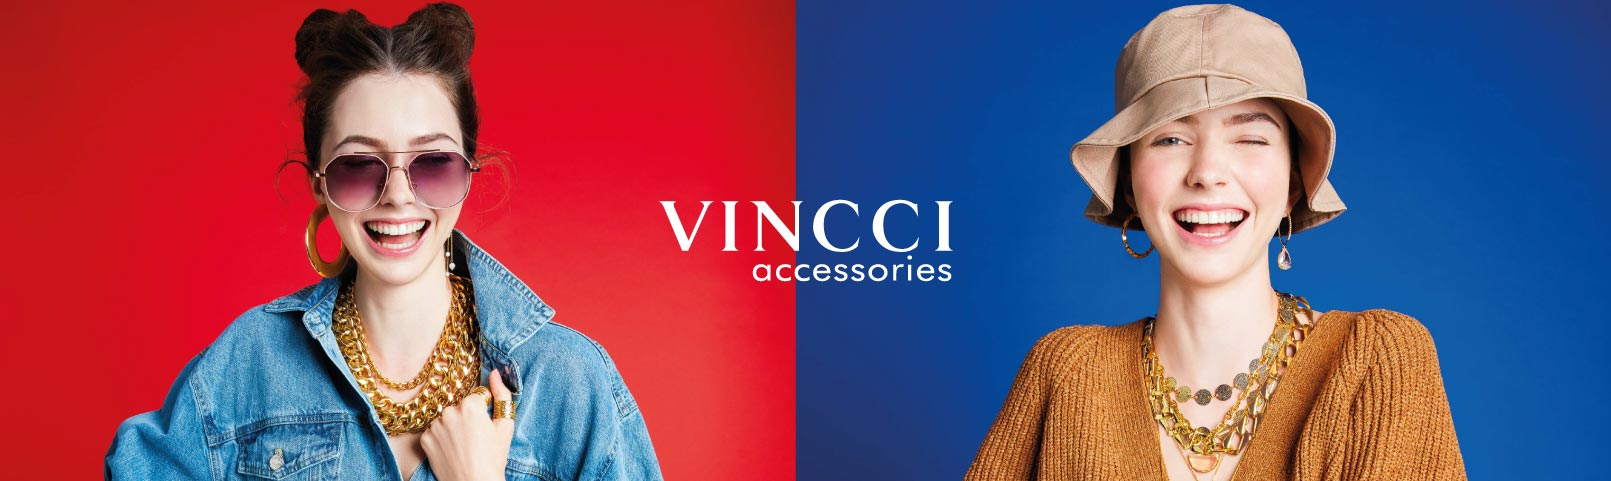 Women - Vincci Accessories